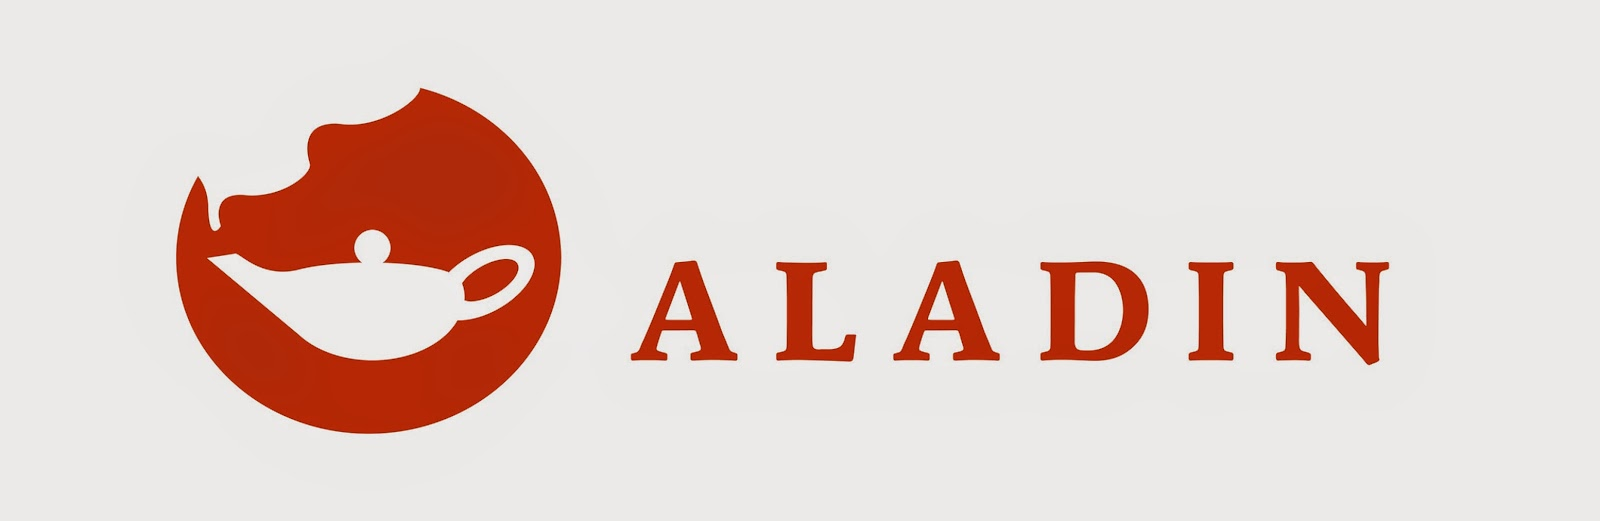 http://aladin-verlag.de/verlag.html